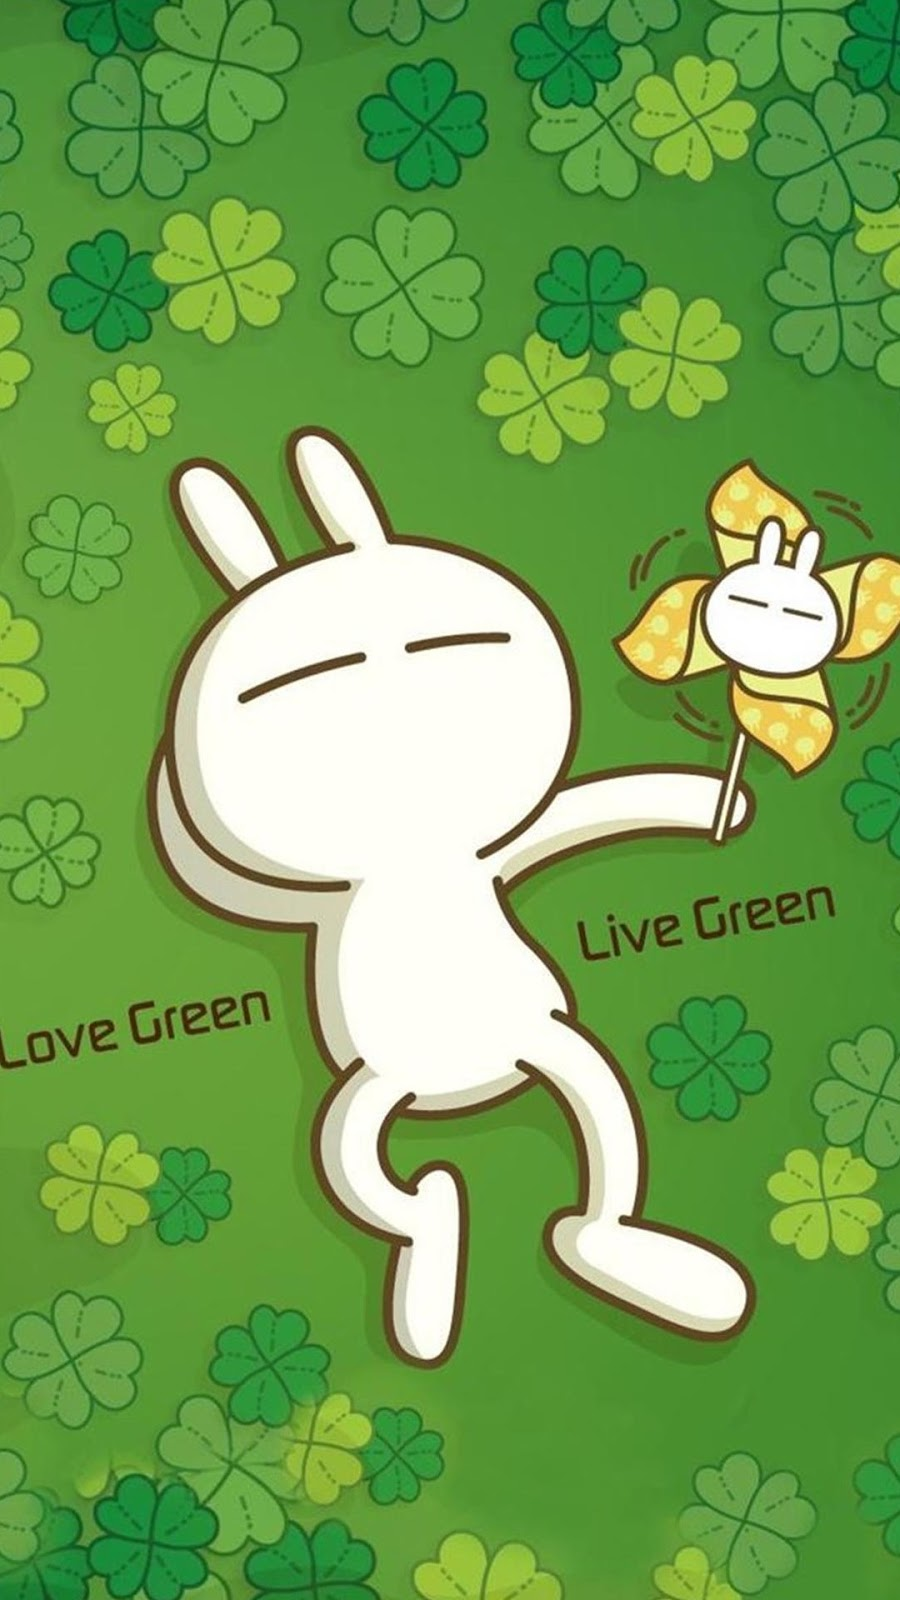 30 Kumpulan Whatsapp Cute Kartun Anime Love Keren Wallpaper Hd